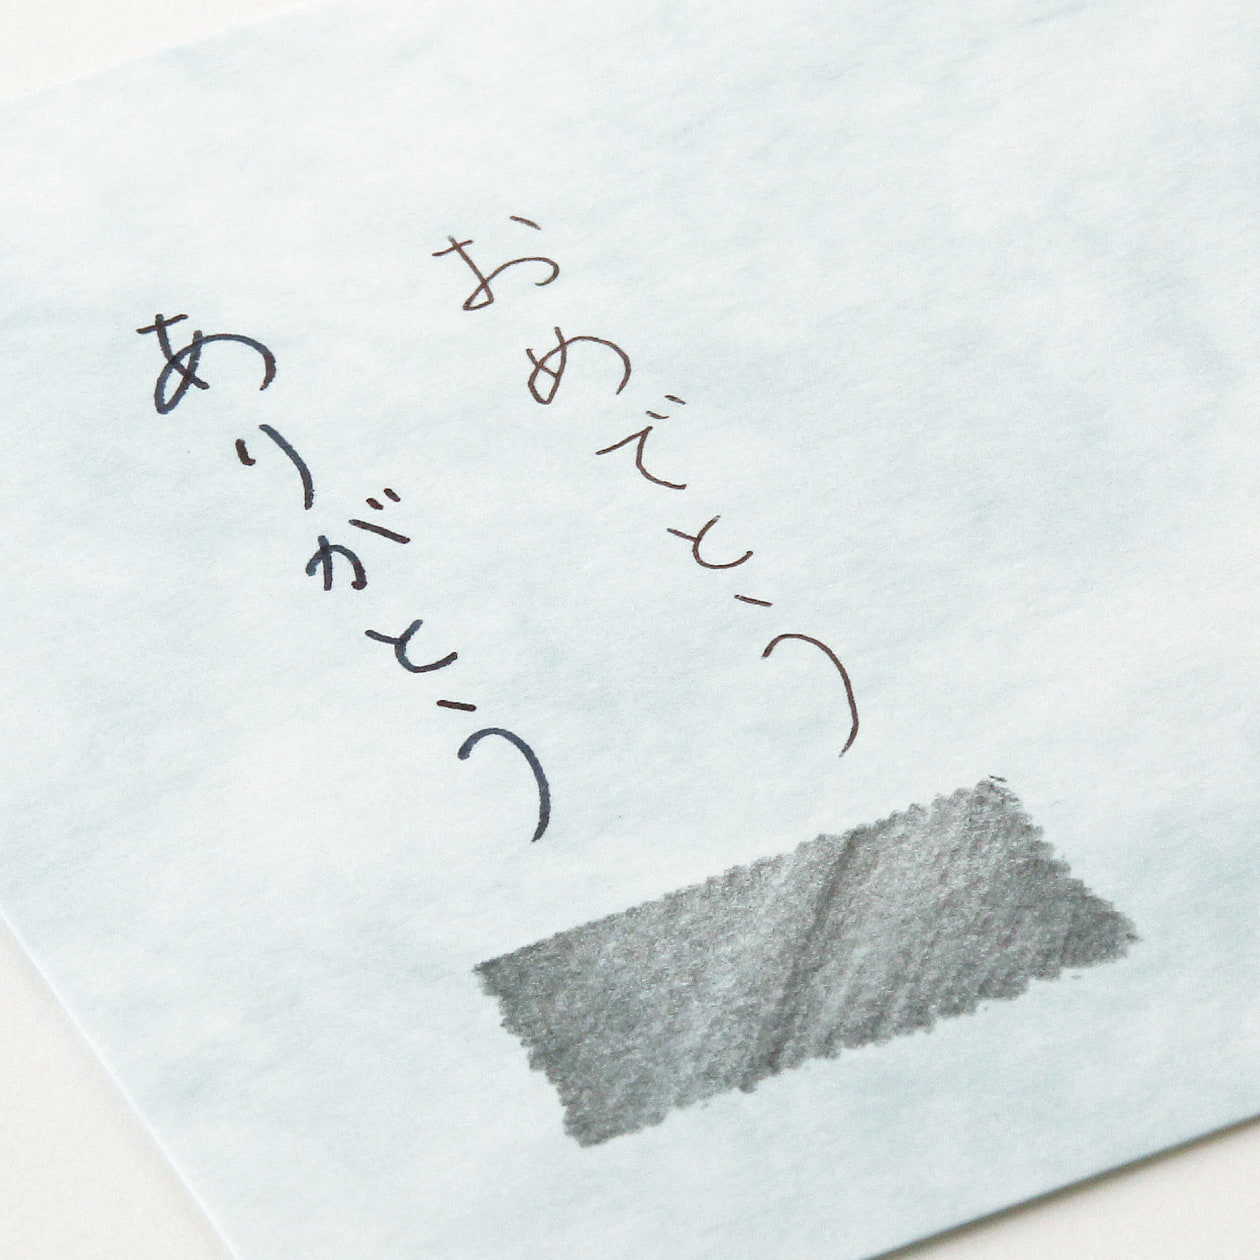 #53VカードR アトモス マリン 197.7g